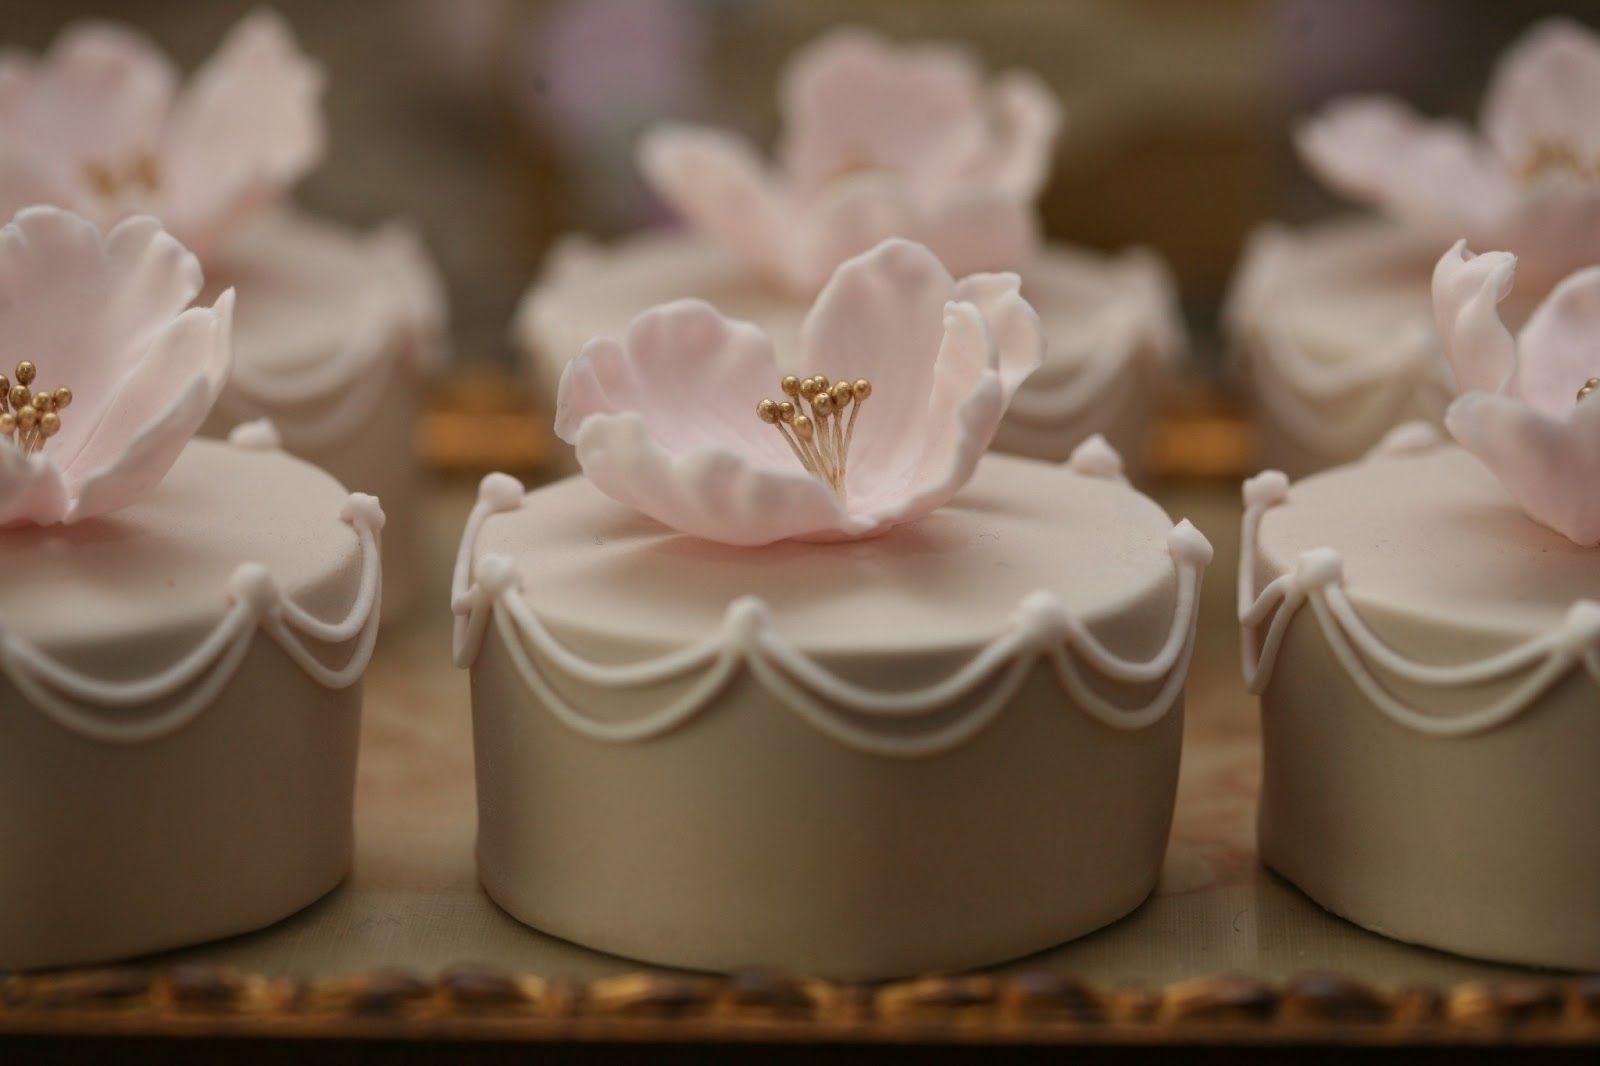 ༺♥༻Mini cake༺♥༻